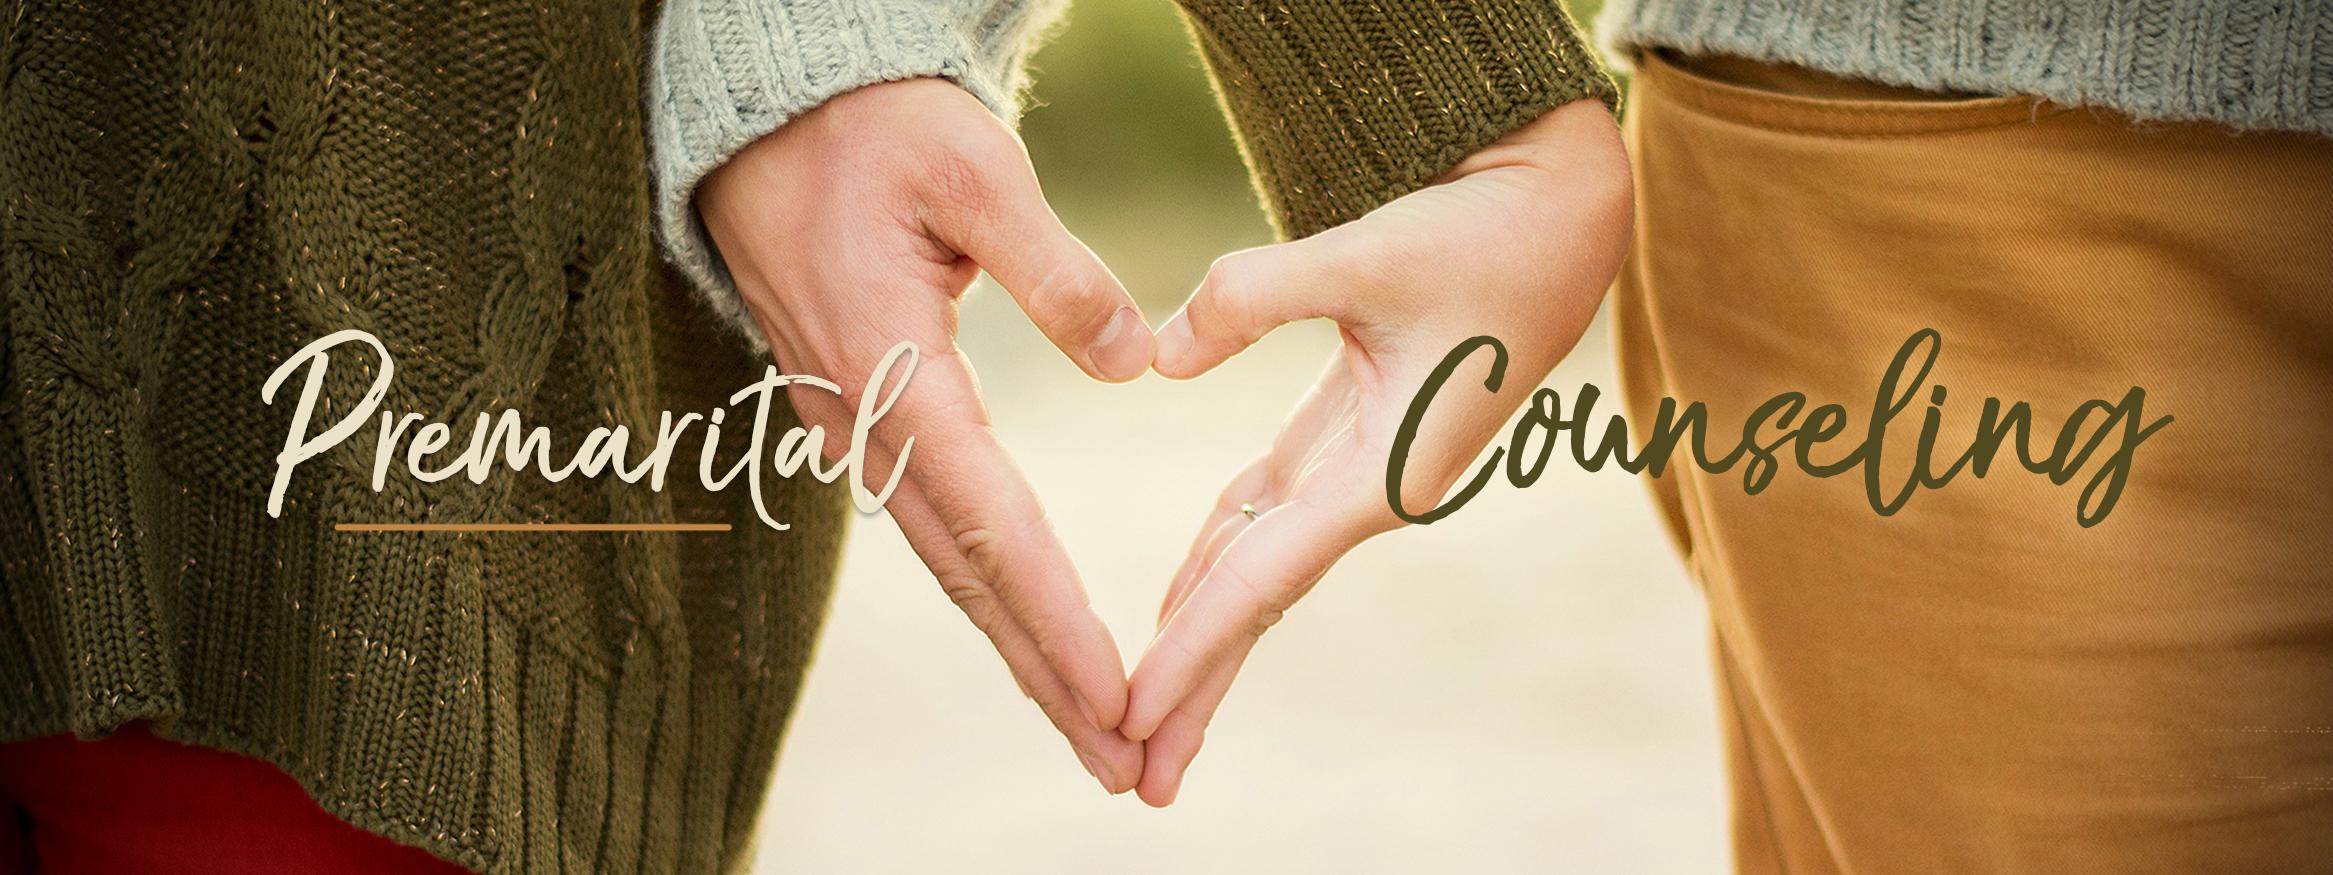 Wedding Counseling 1